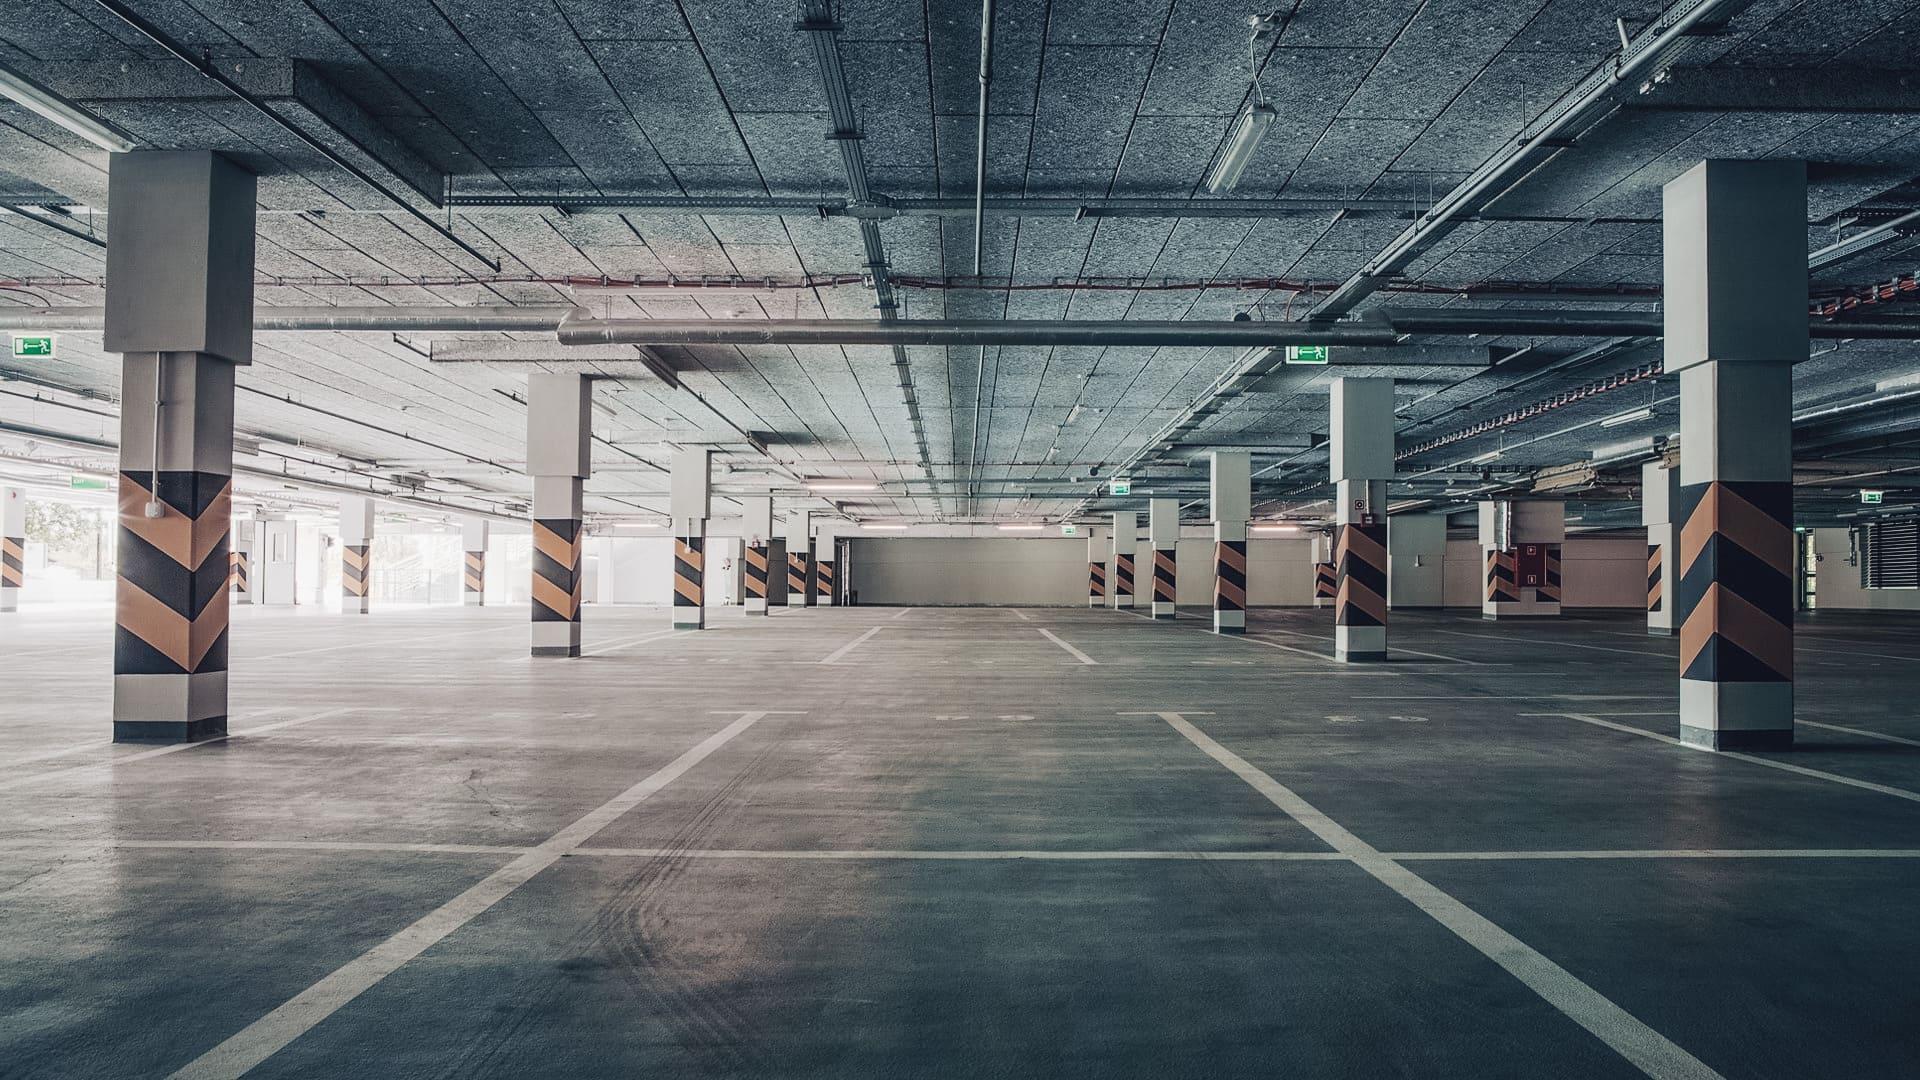 Gidroizolyaciya parkinga 4 - Гидроизоляция паркинга